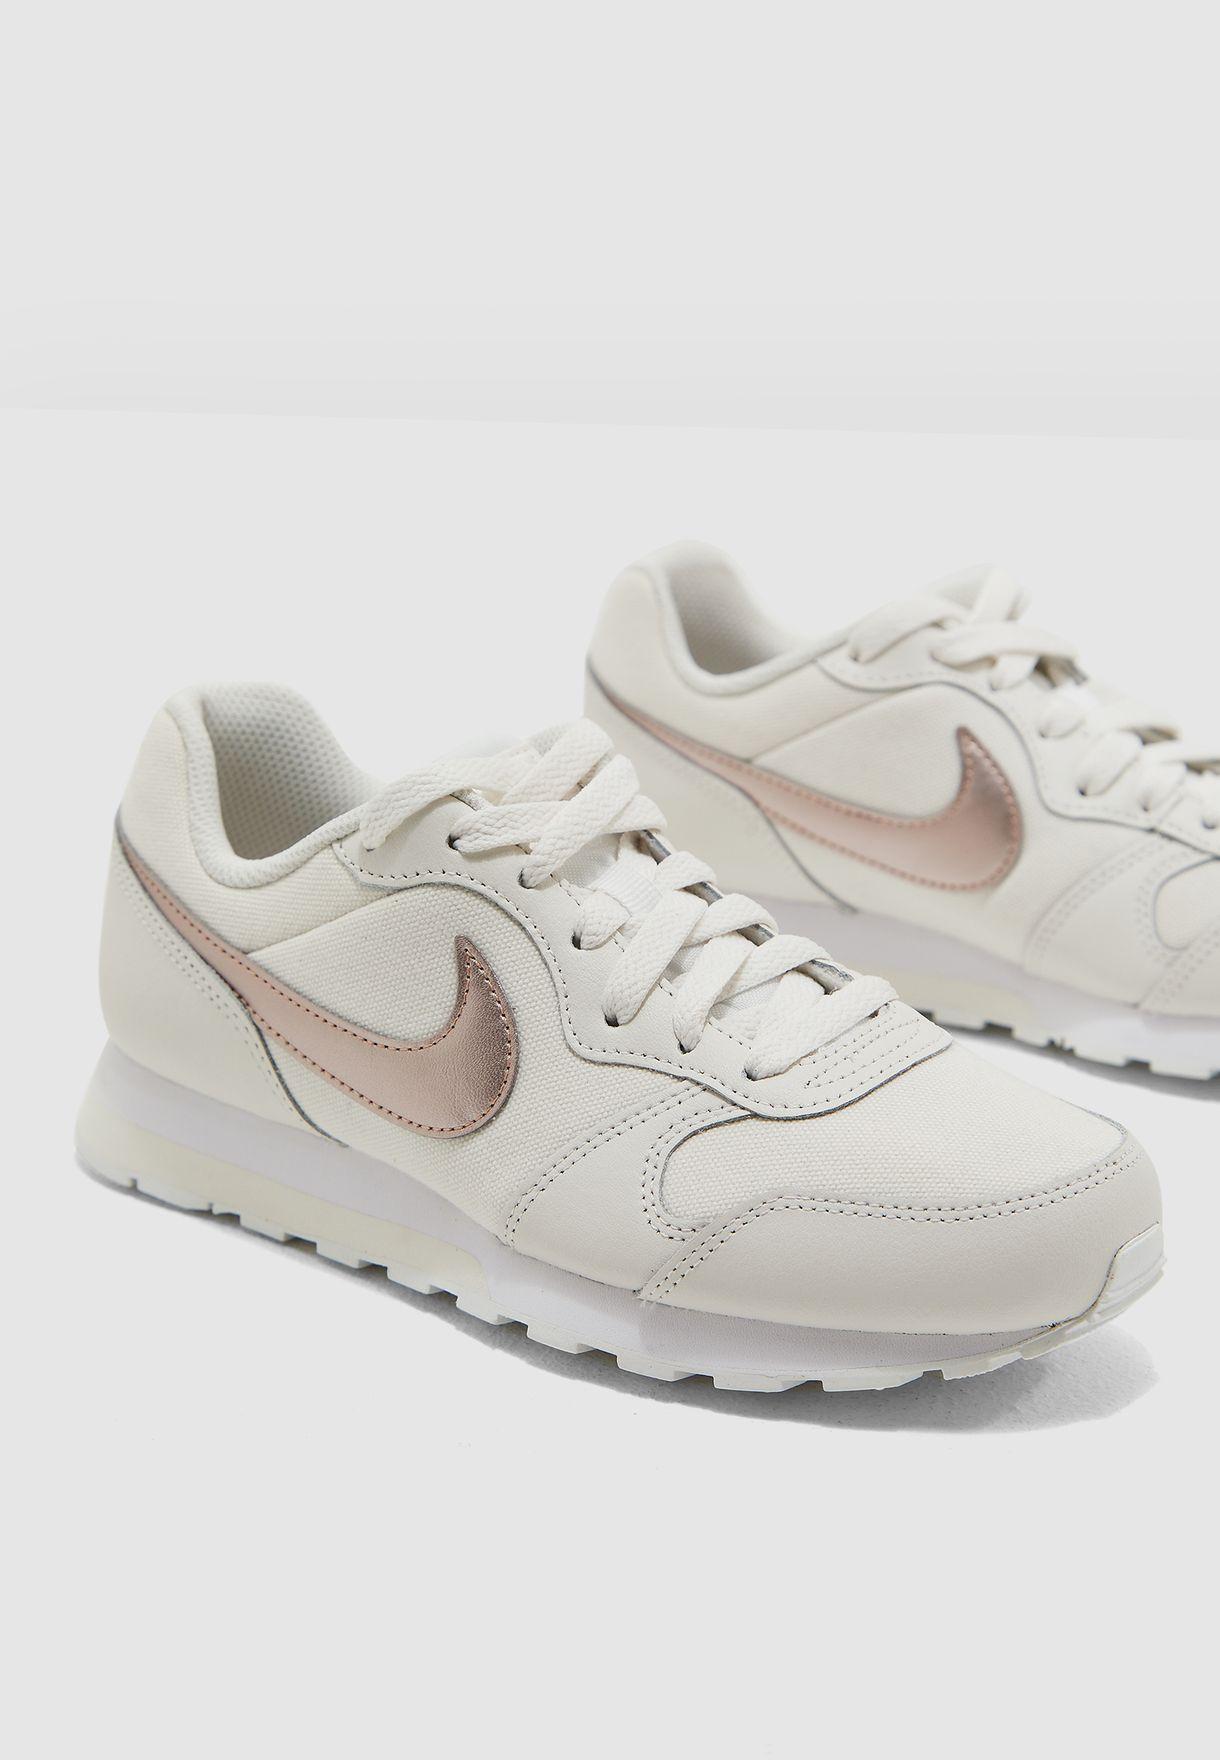 48943ce9d0e8e Shop Nike white Youth MD Runner 2 807319-016 for Kids in UAE ...